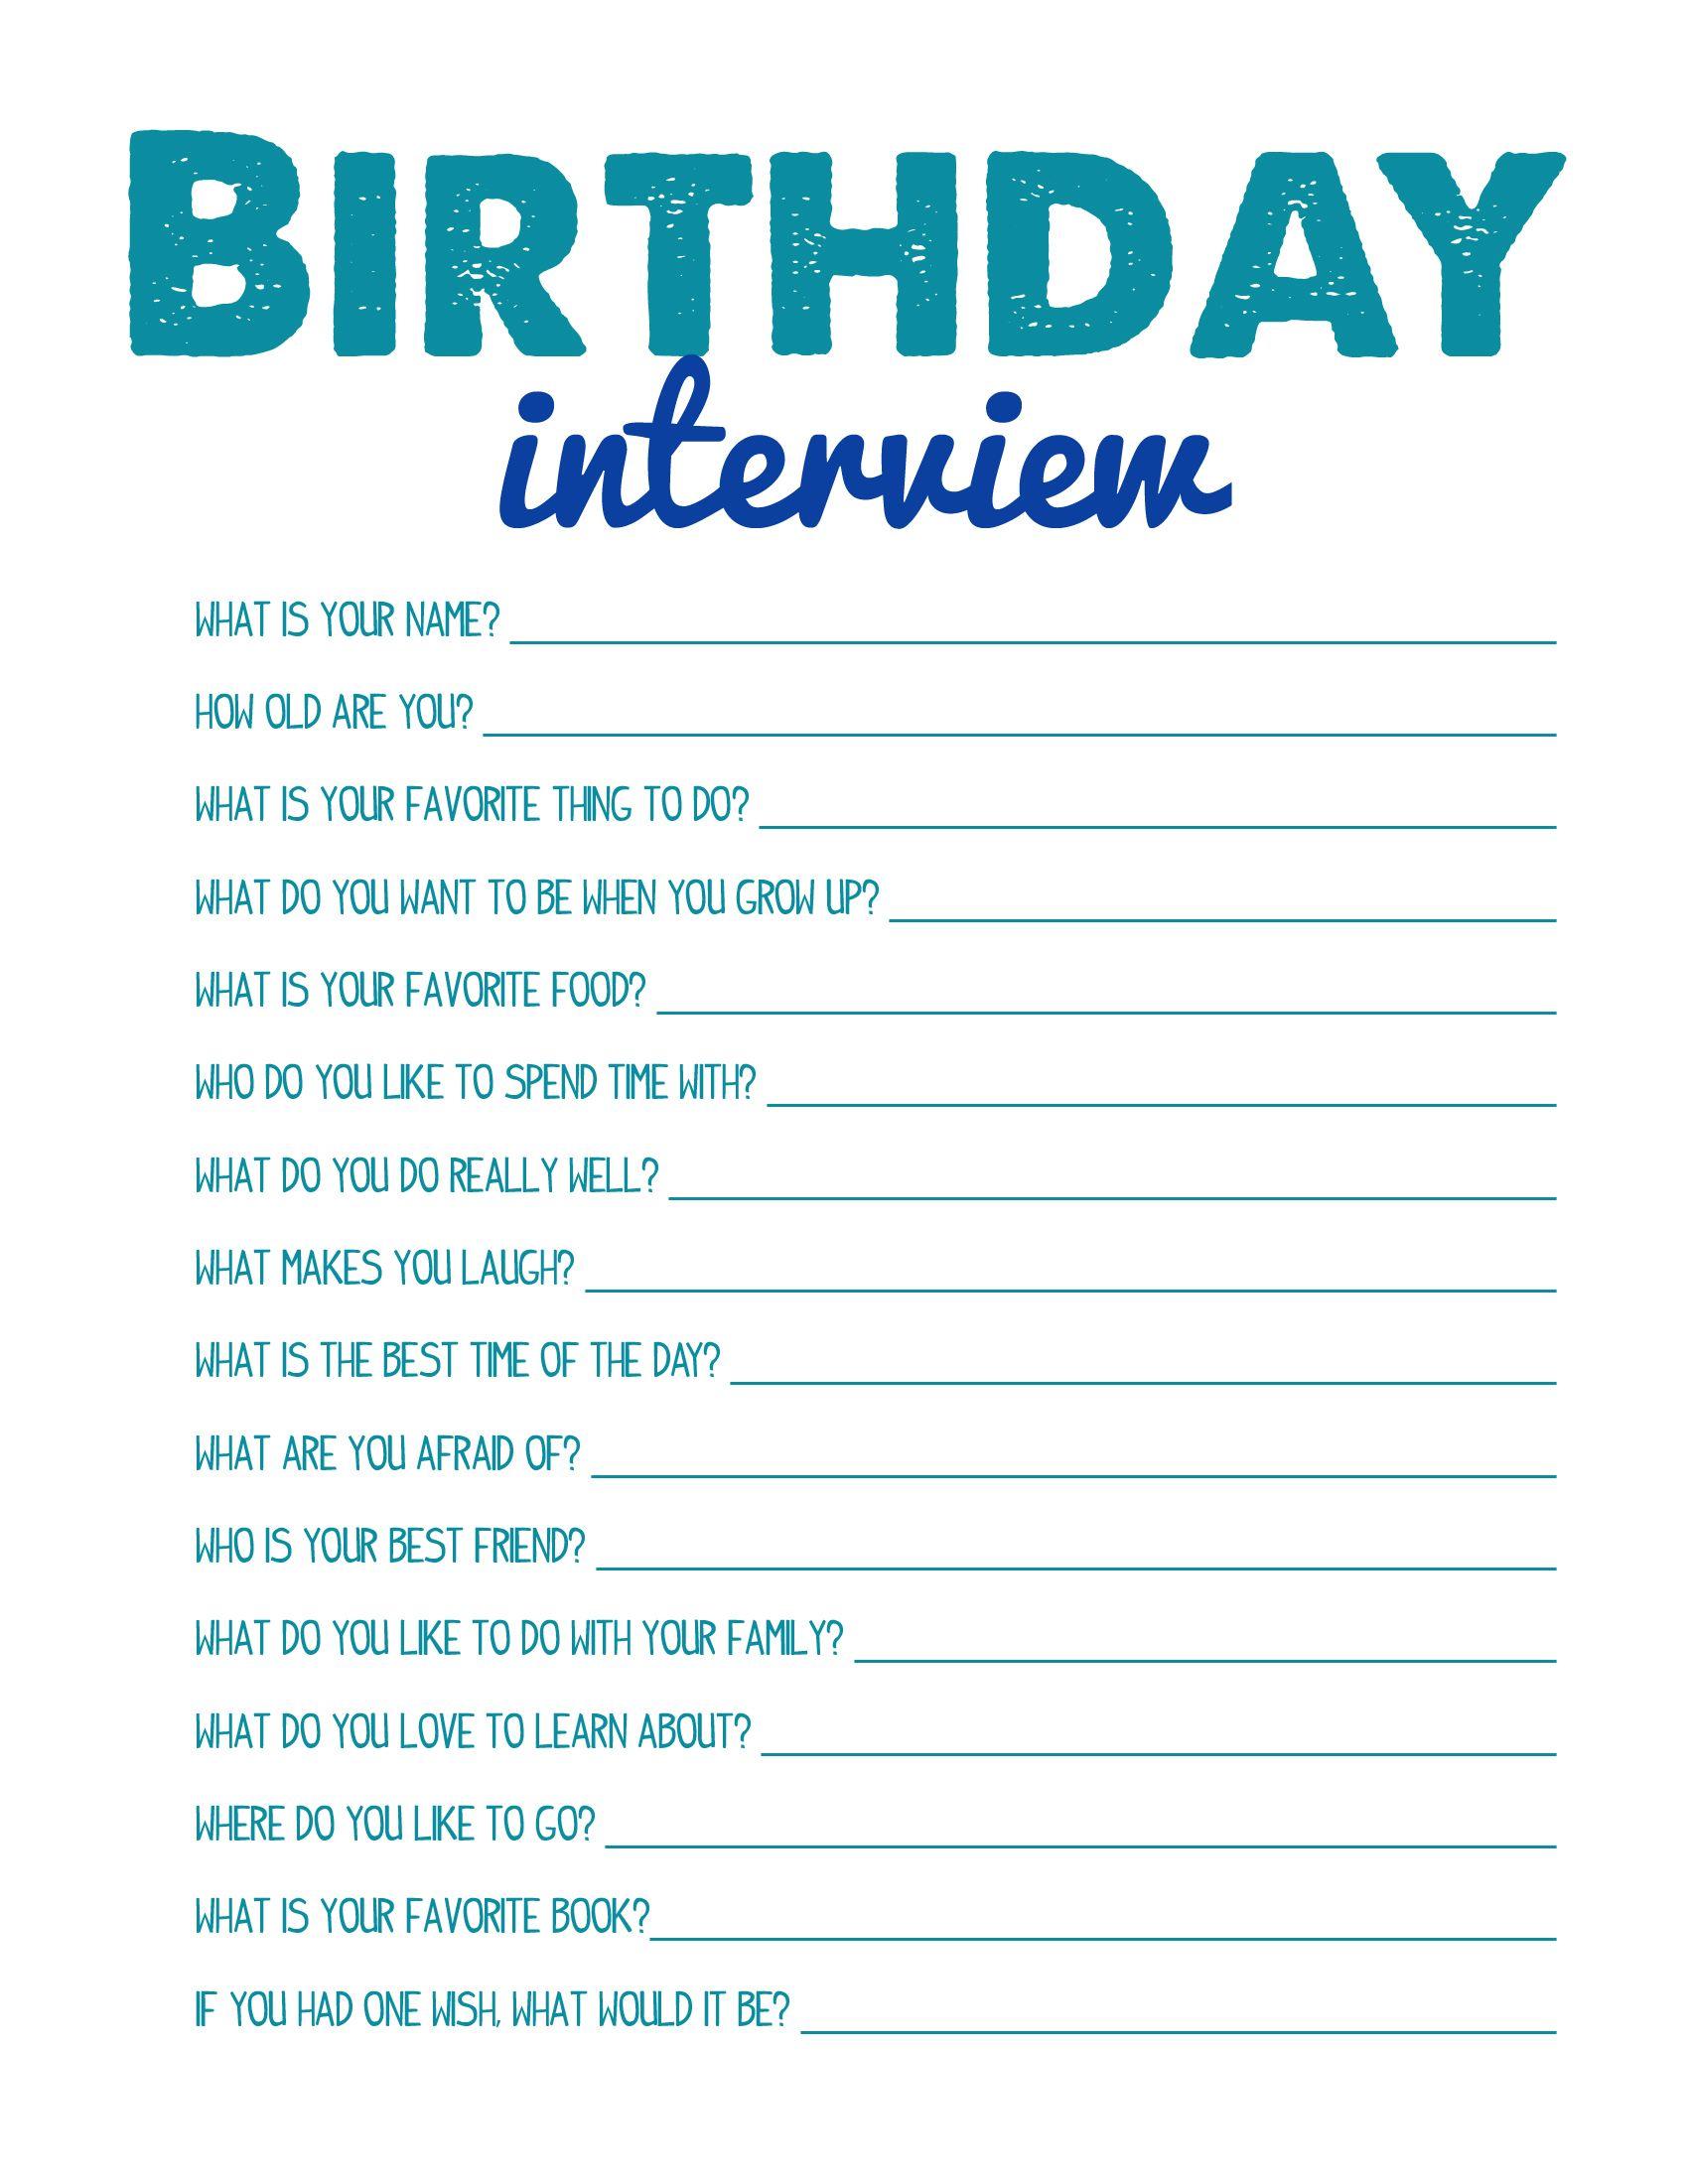 Birthday Interview Printable